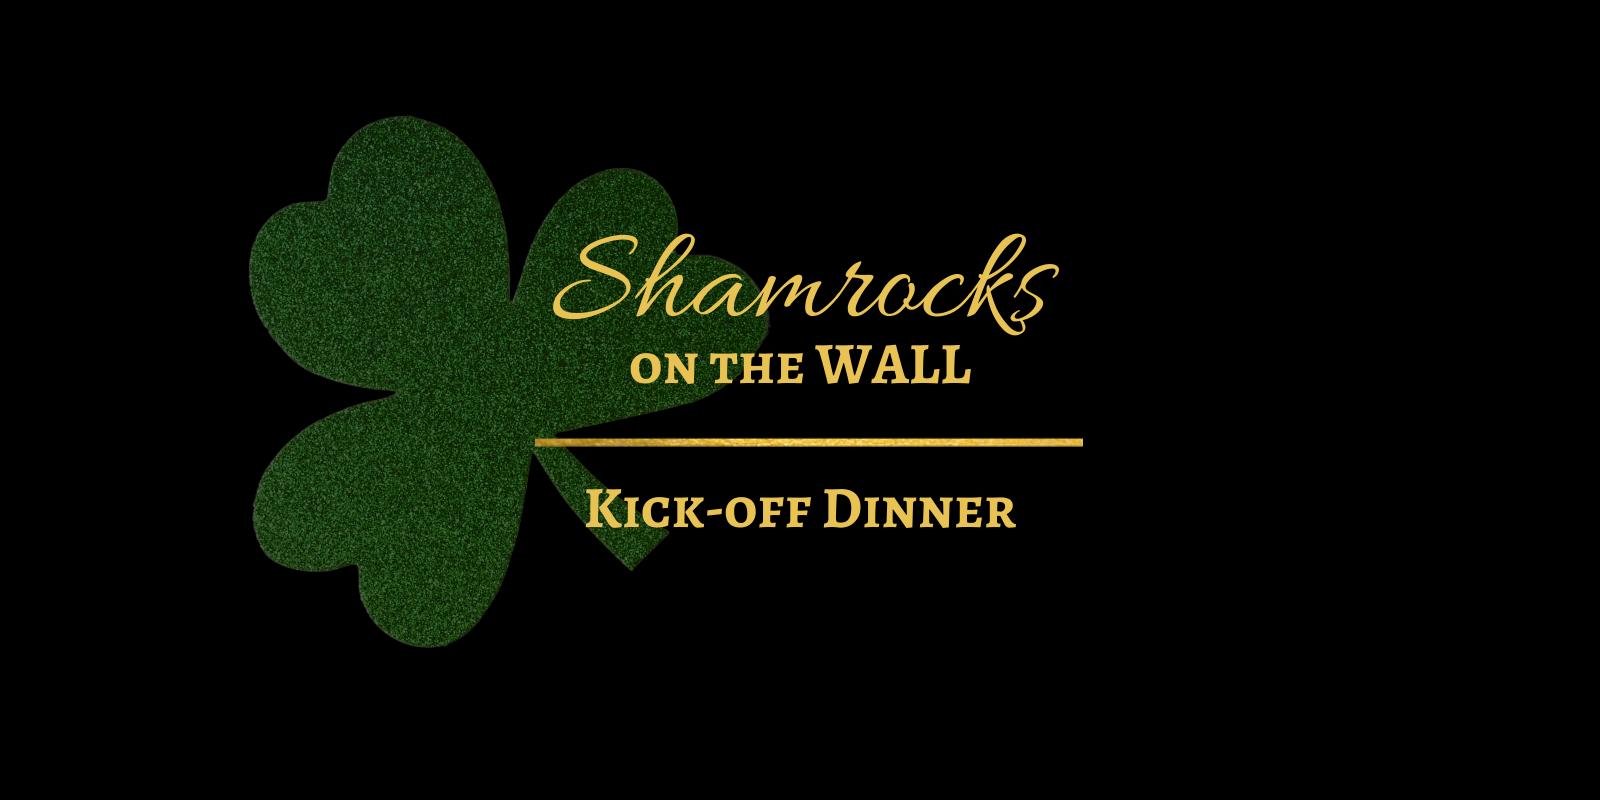 Shamrocks on the Wall Kick off Dinner